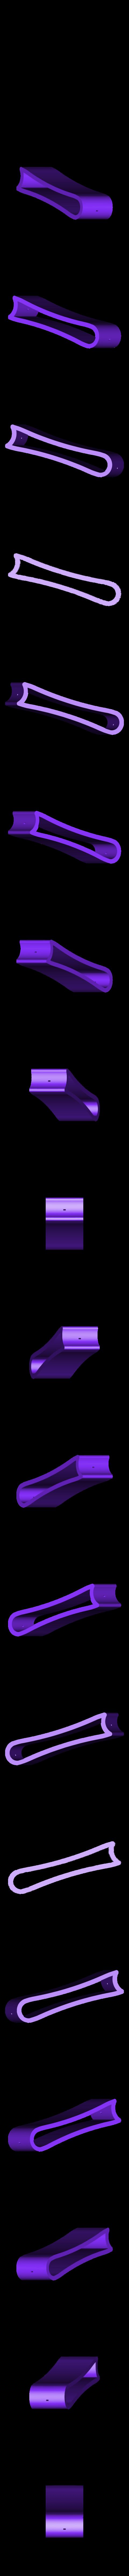 C4_X1.stl Download STL file Adjustable lamp - with vertebrae  • 3D printable object, Ciokobango